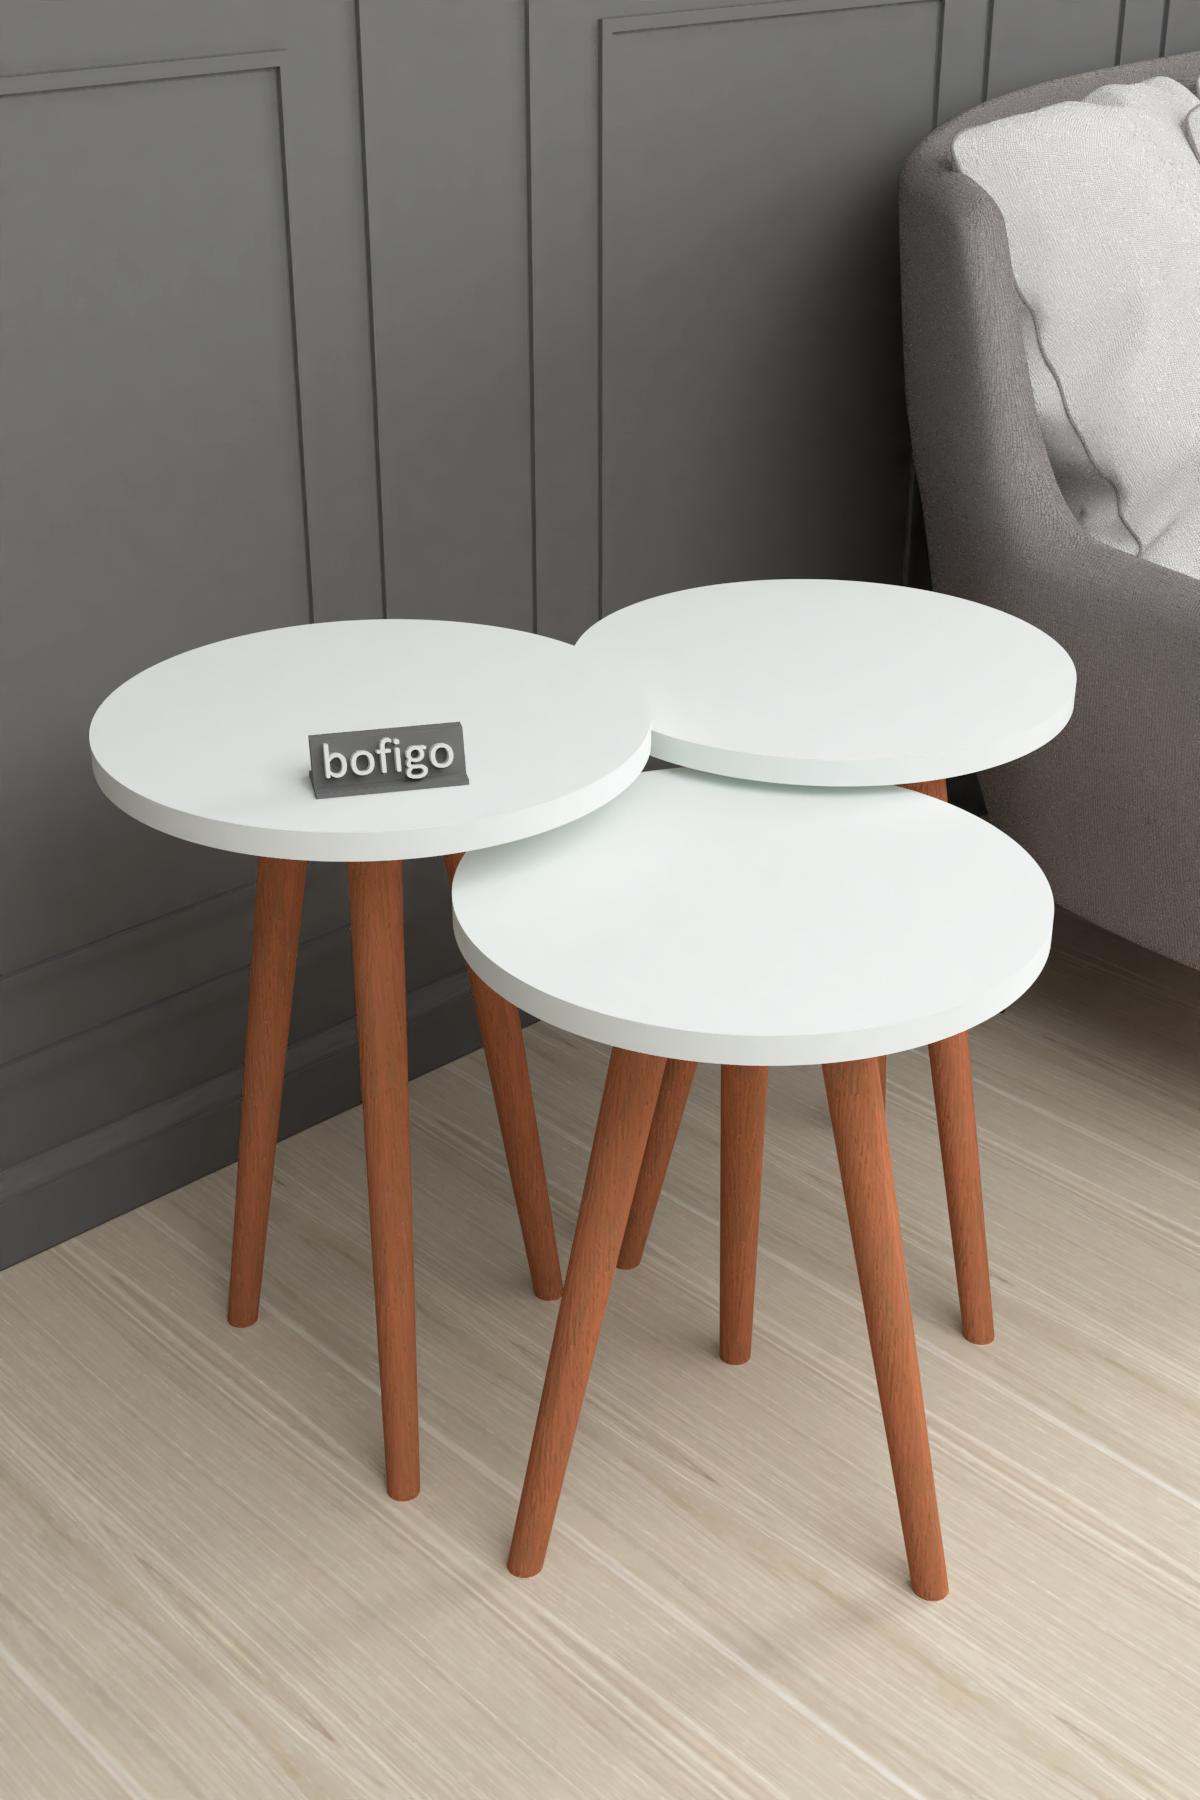 Bofigo Wooden Leg Nesting Table White